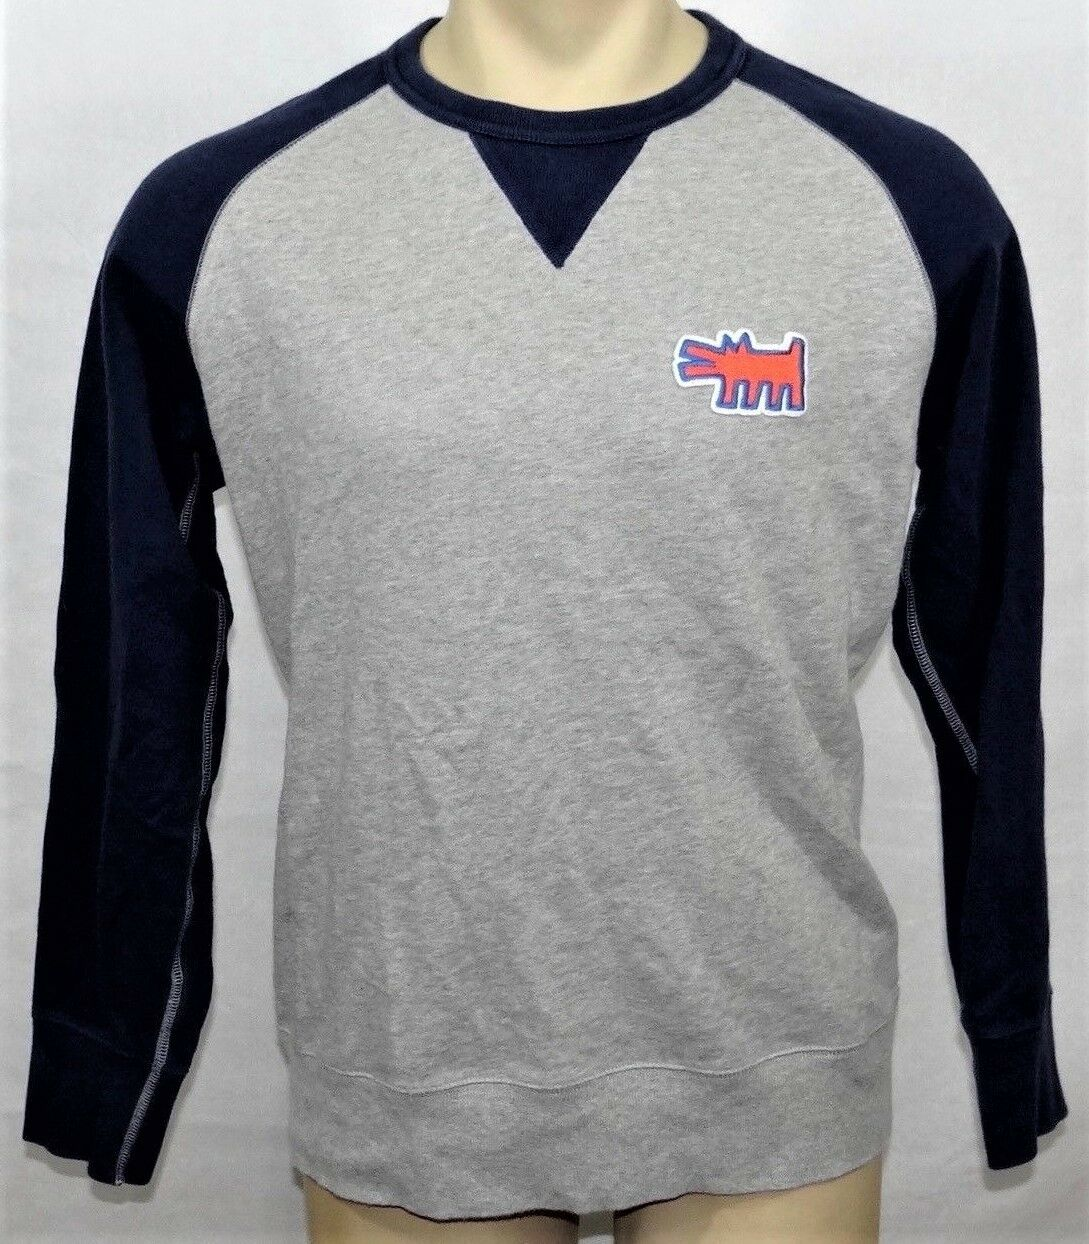 KEITH HARING x UNIQLO 'Dog' Patch SPRZ NY Art Sweatshirt M grau / Navy NWT